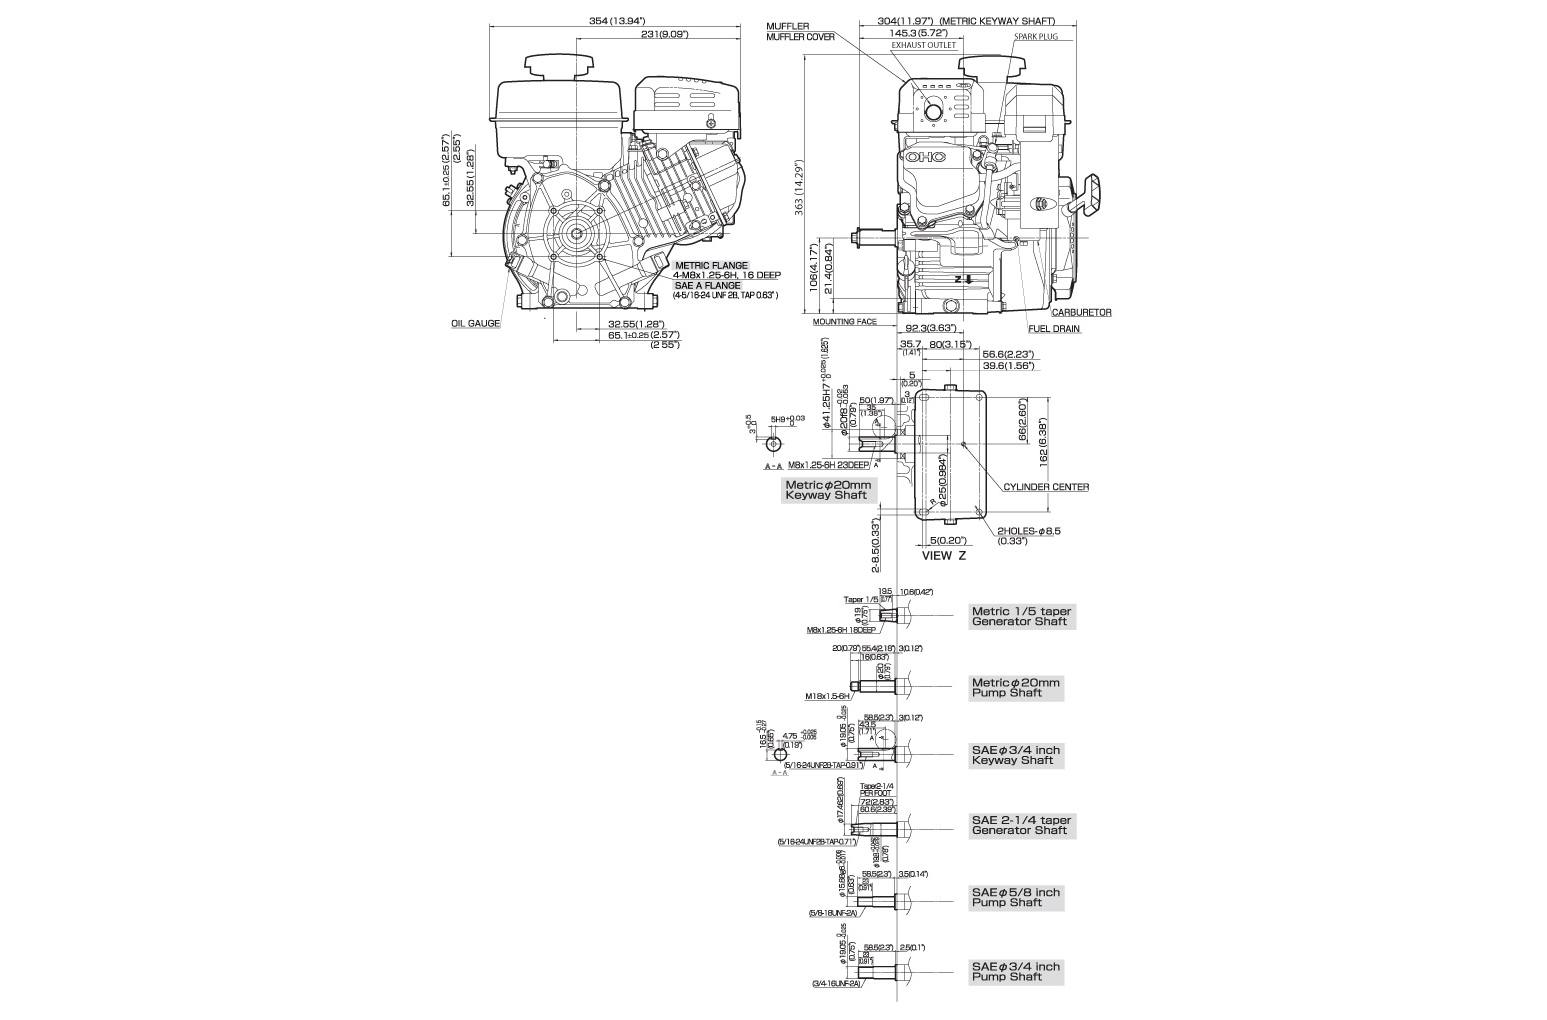 2017 Robin Subaru Ex17 For Sale In Edmonton Ab Alberta Small Chainsaw Engine Exhaust Valve Diagram Previous